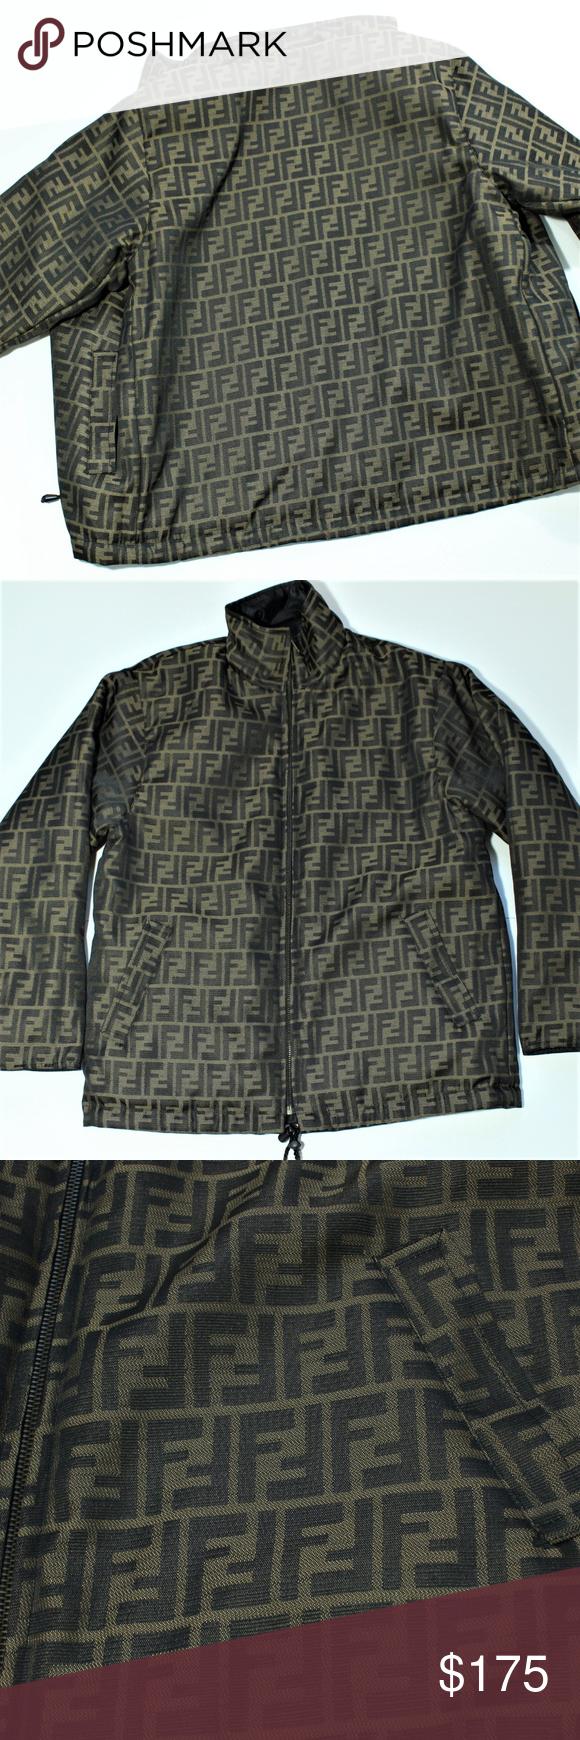 Vintage Reversible Fendi Zucca Monogram Jacket Monogram Jacket Fendi Jackets